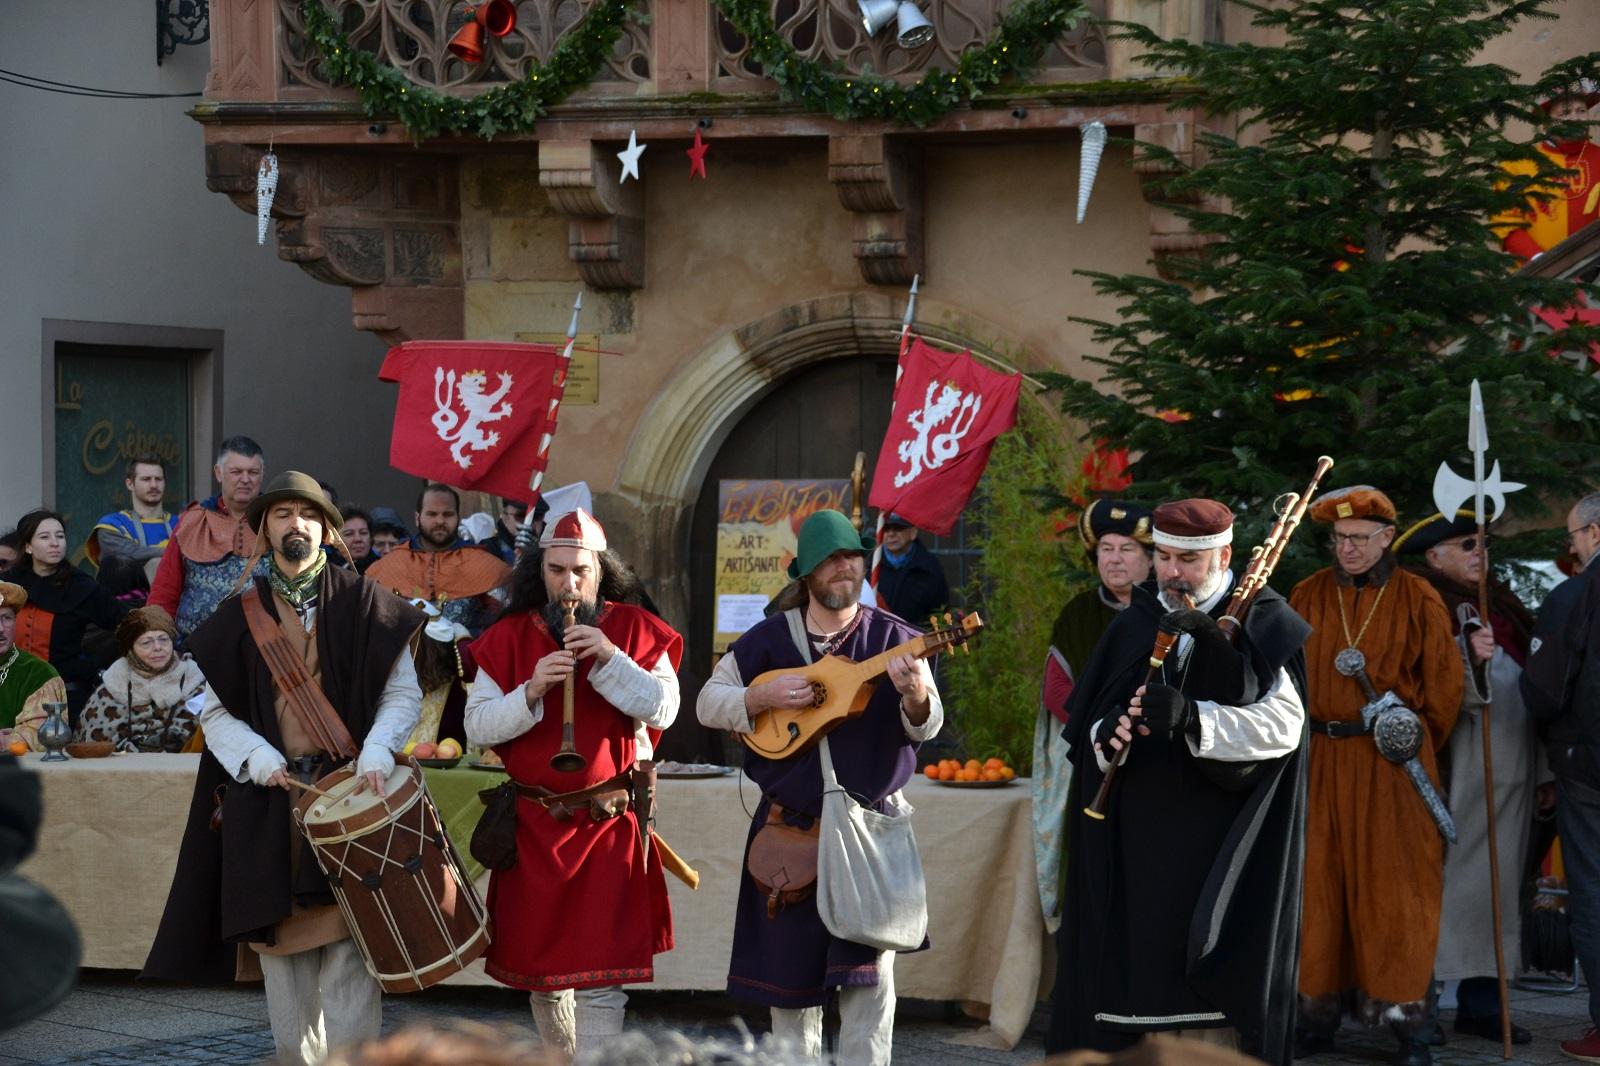 Noël d'Antan à Molsheim - crédit photo : Comité des Fêtes Molsheim